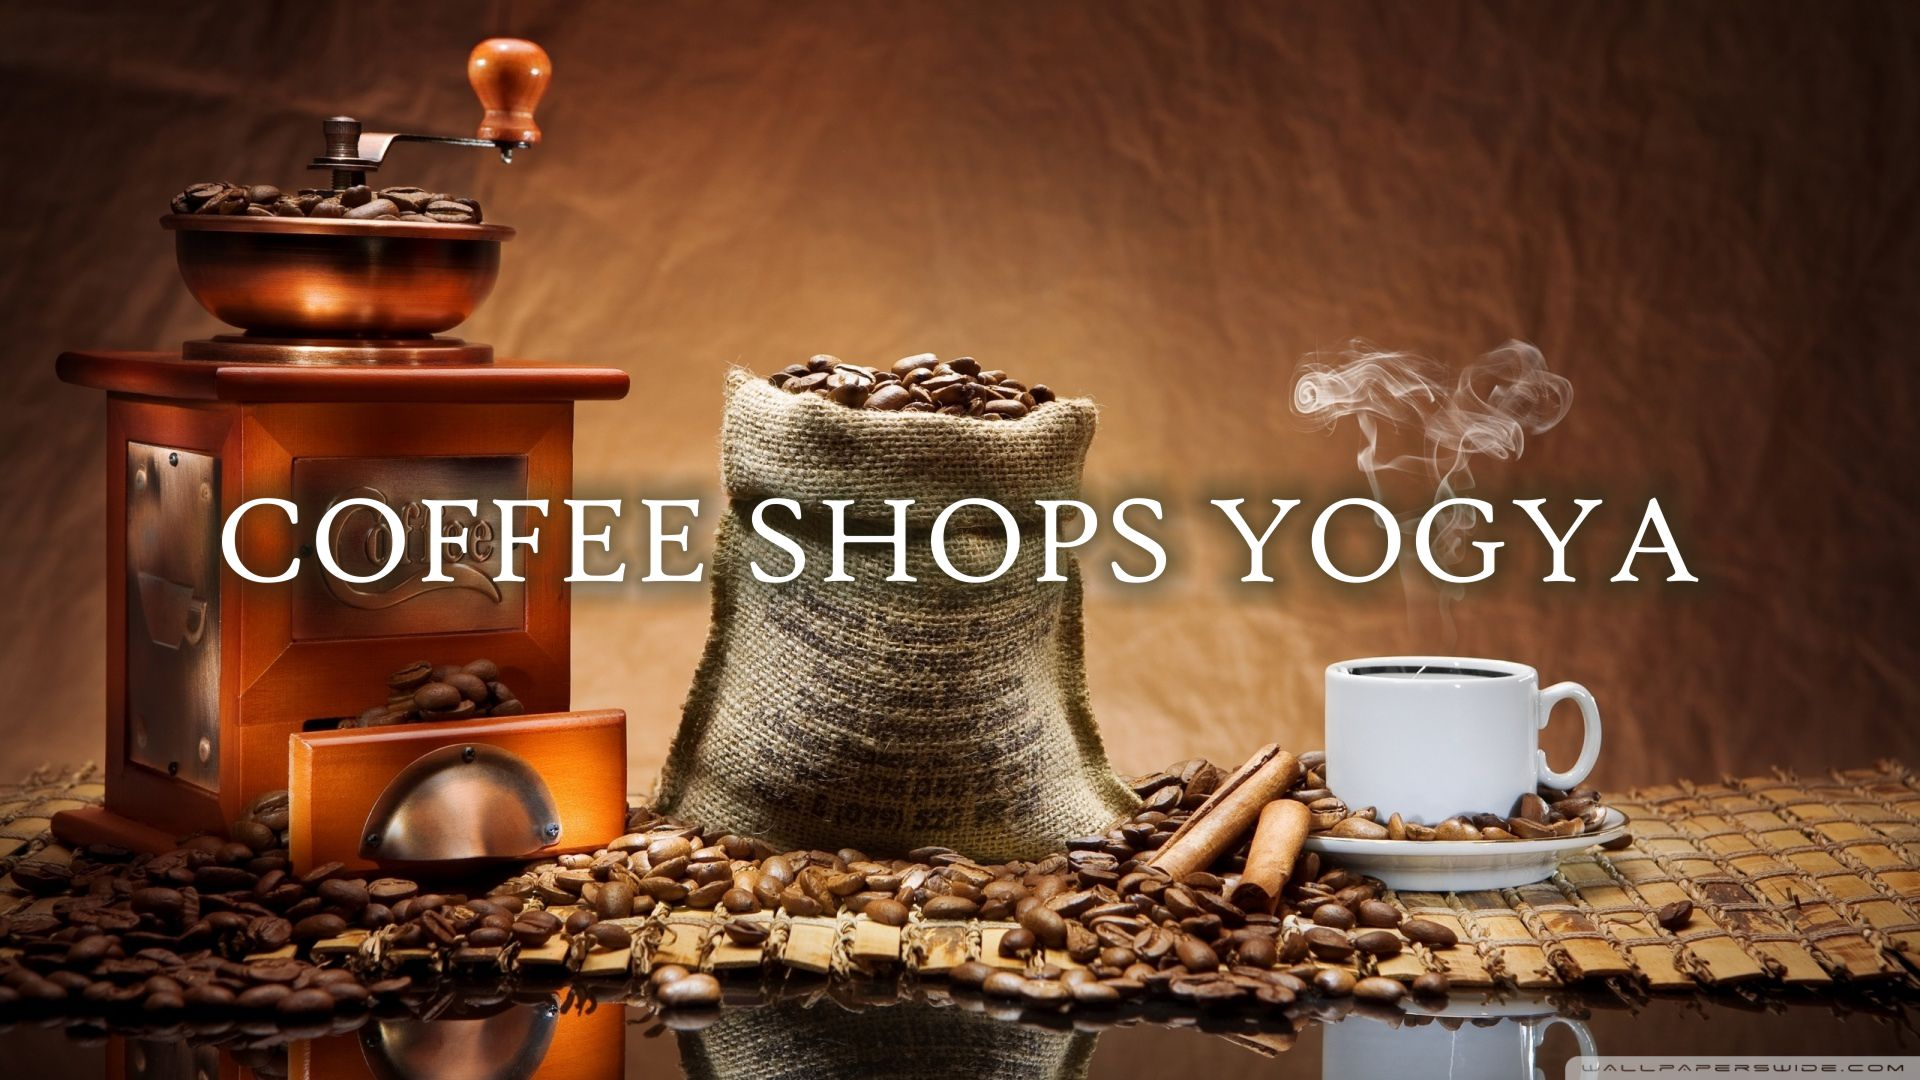 16 Tempat Ngopi Paling Asik di Jogja - COFFEE SHOPS YOGYA